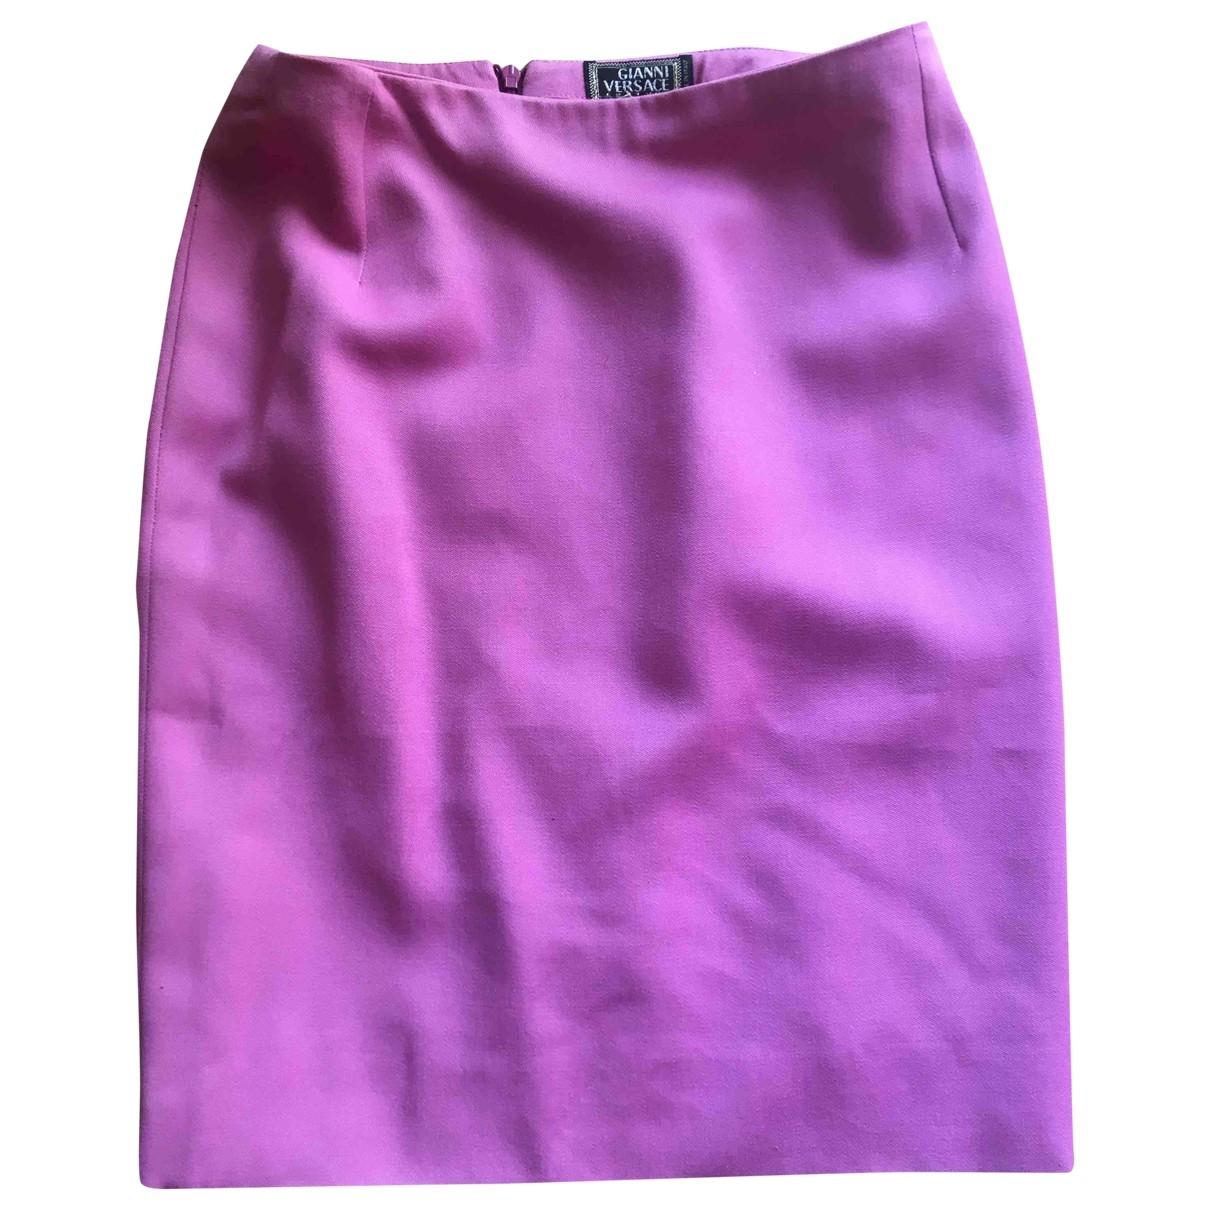 Gianni Versace \N Pink Wool skirt for Women 44 IT